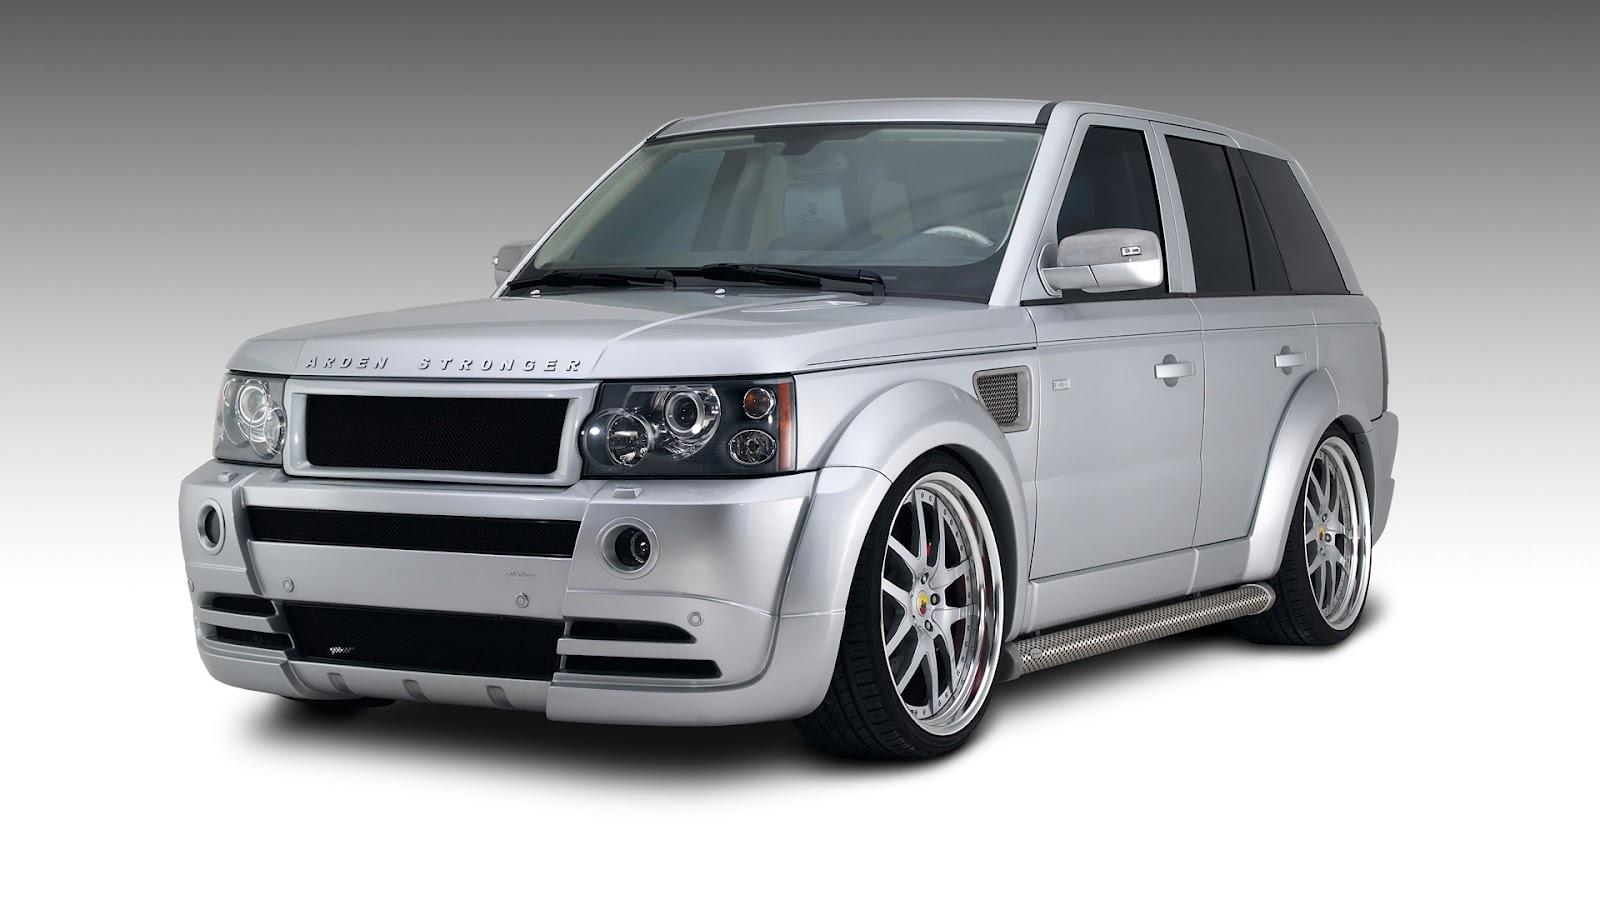 Range Rover Wallpaper Hd: Land Rover Hd Wallpaper